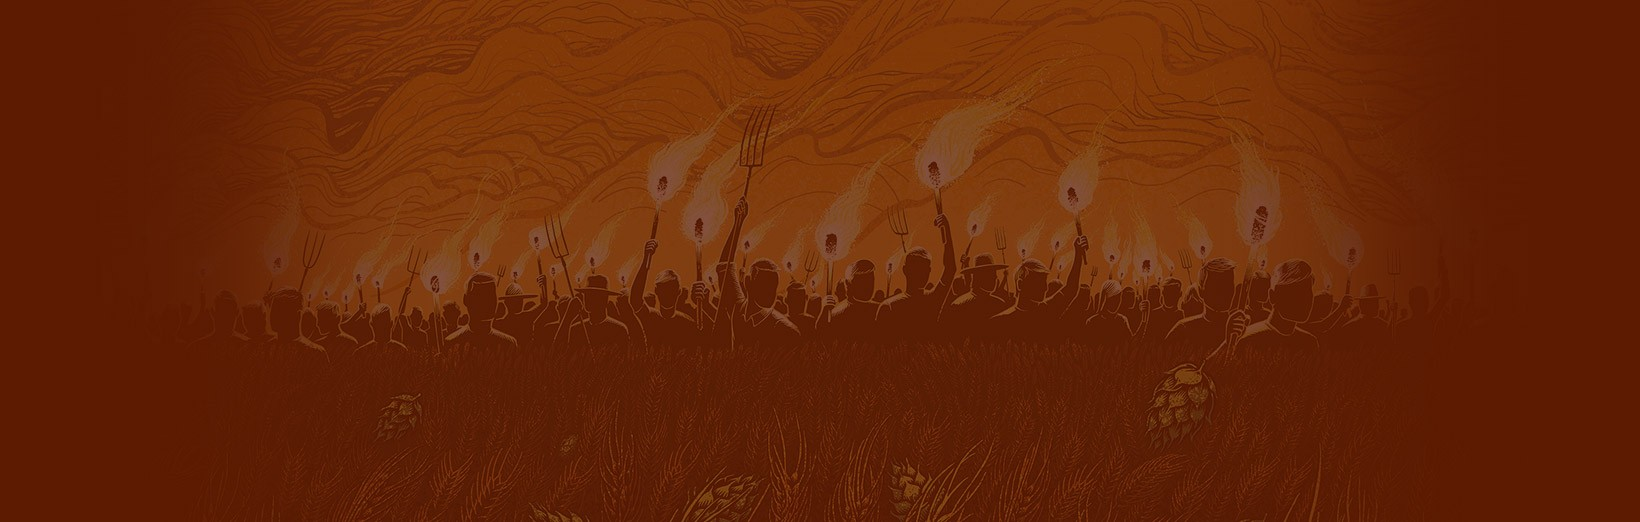 Riot Background